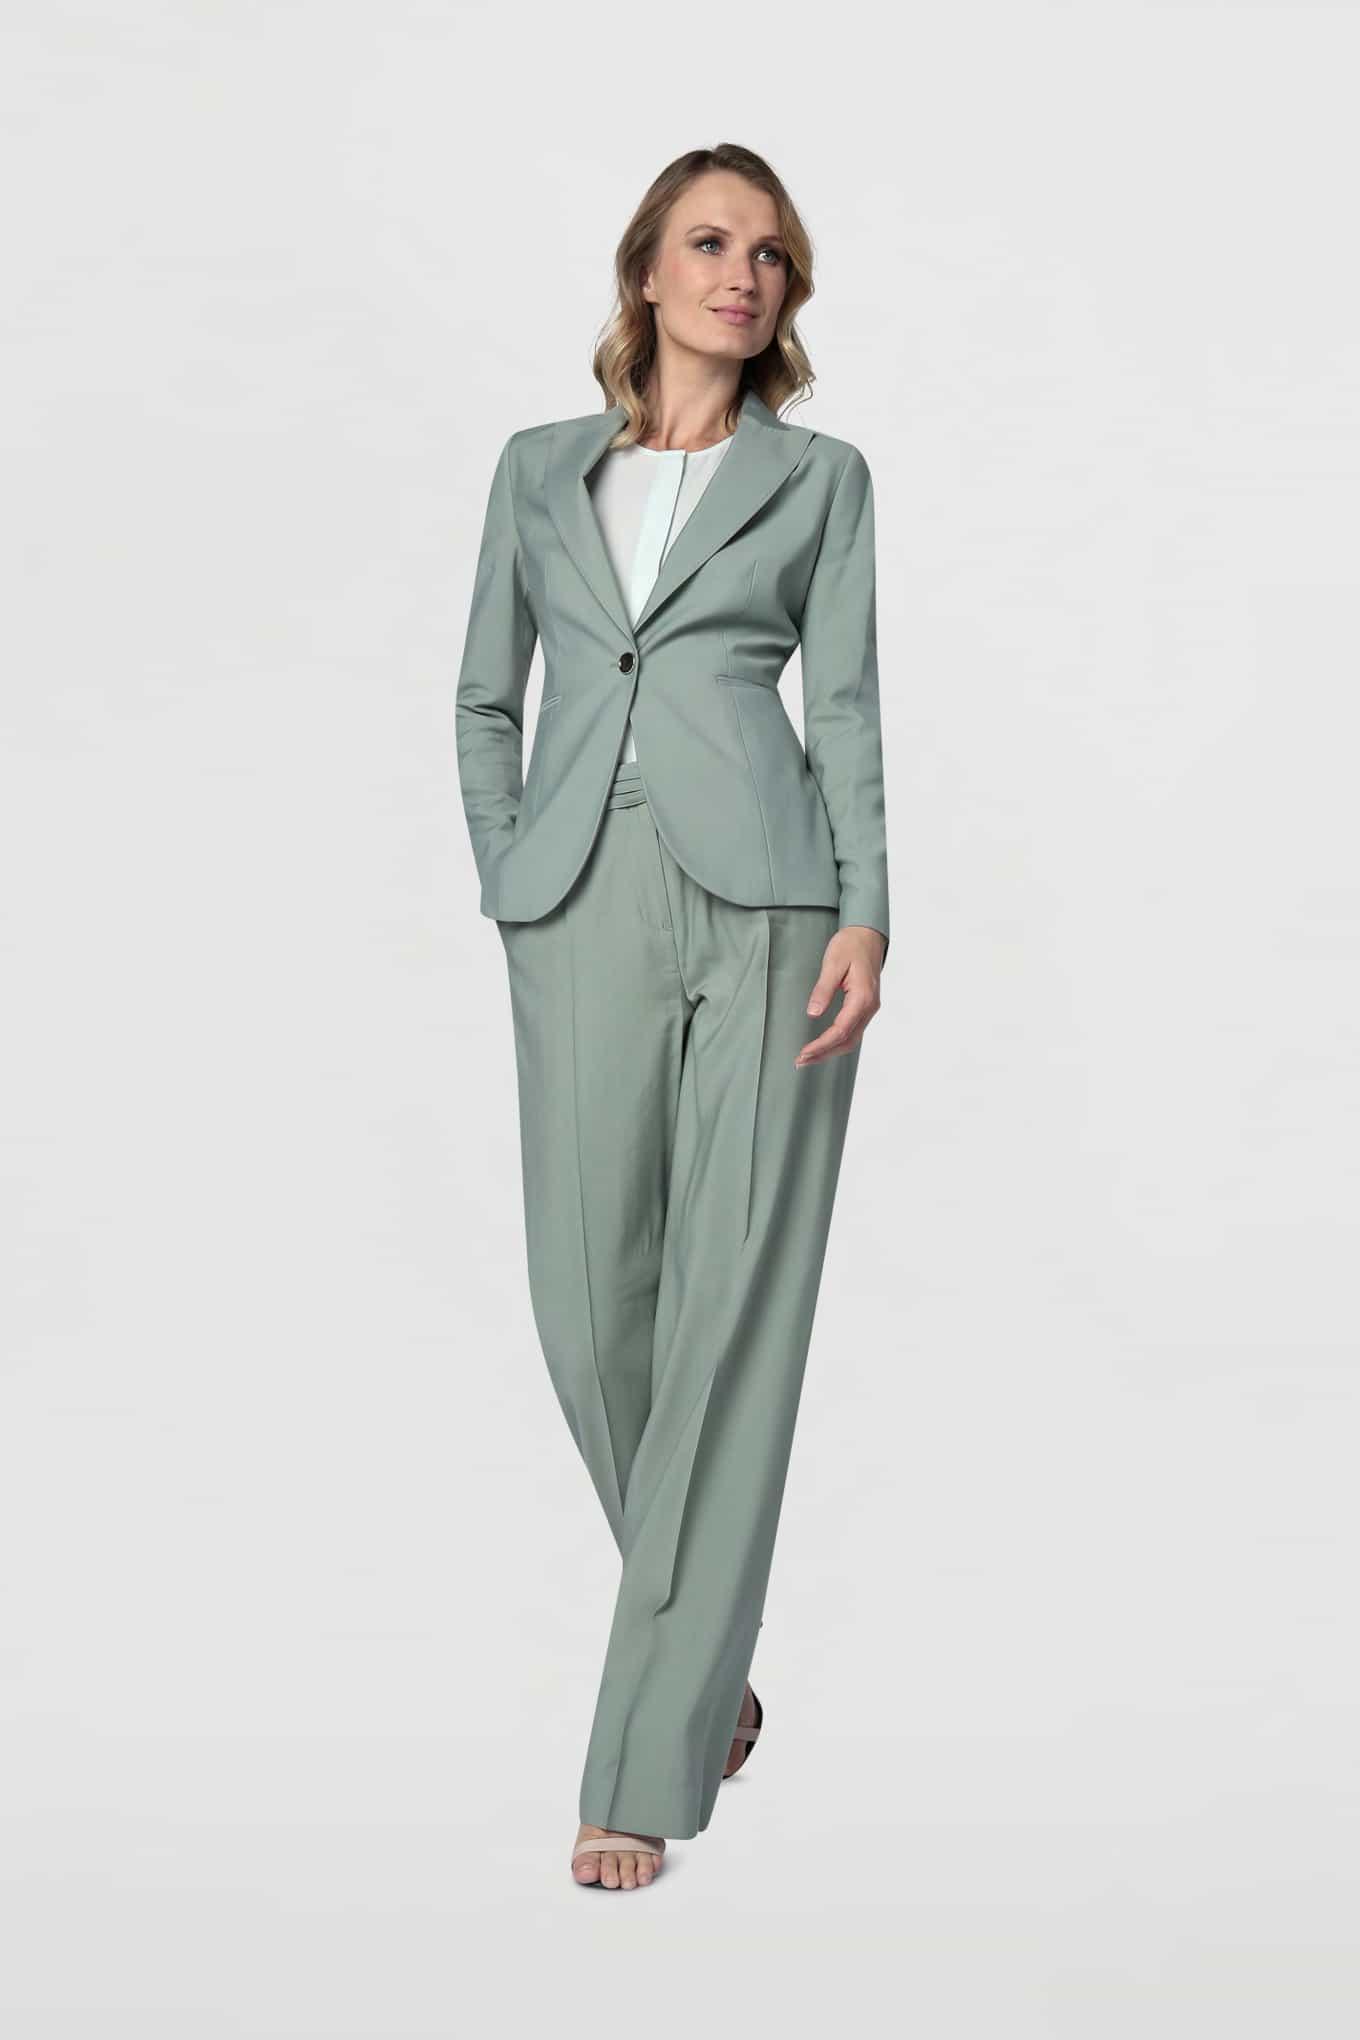 Blazer Mint Classic Woman